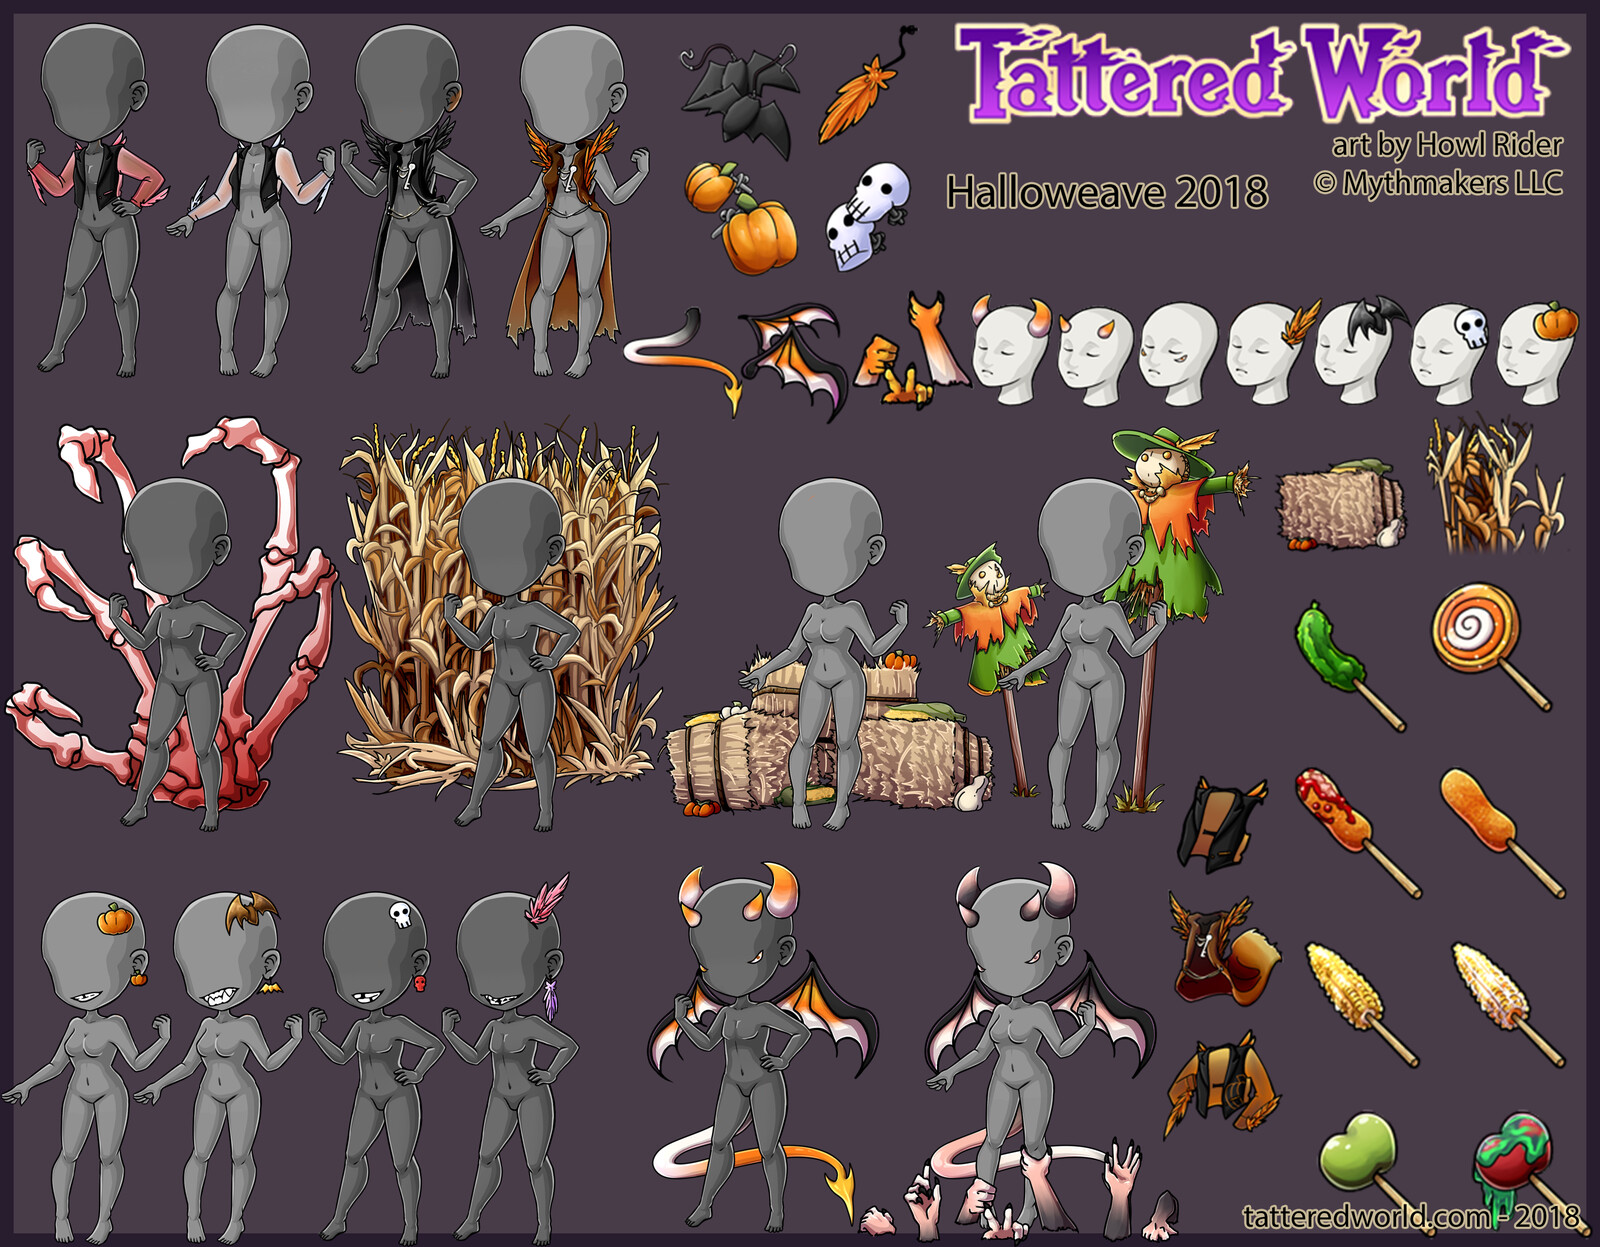 Halloween themed apparel items.